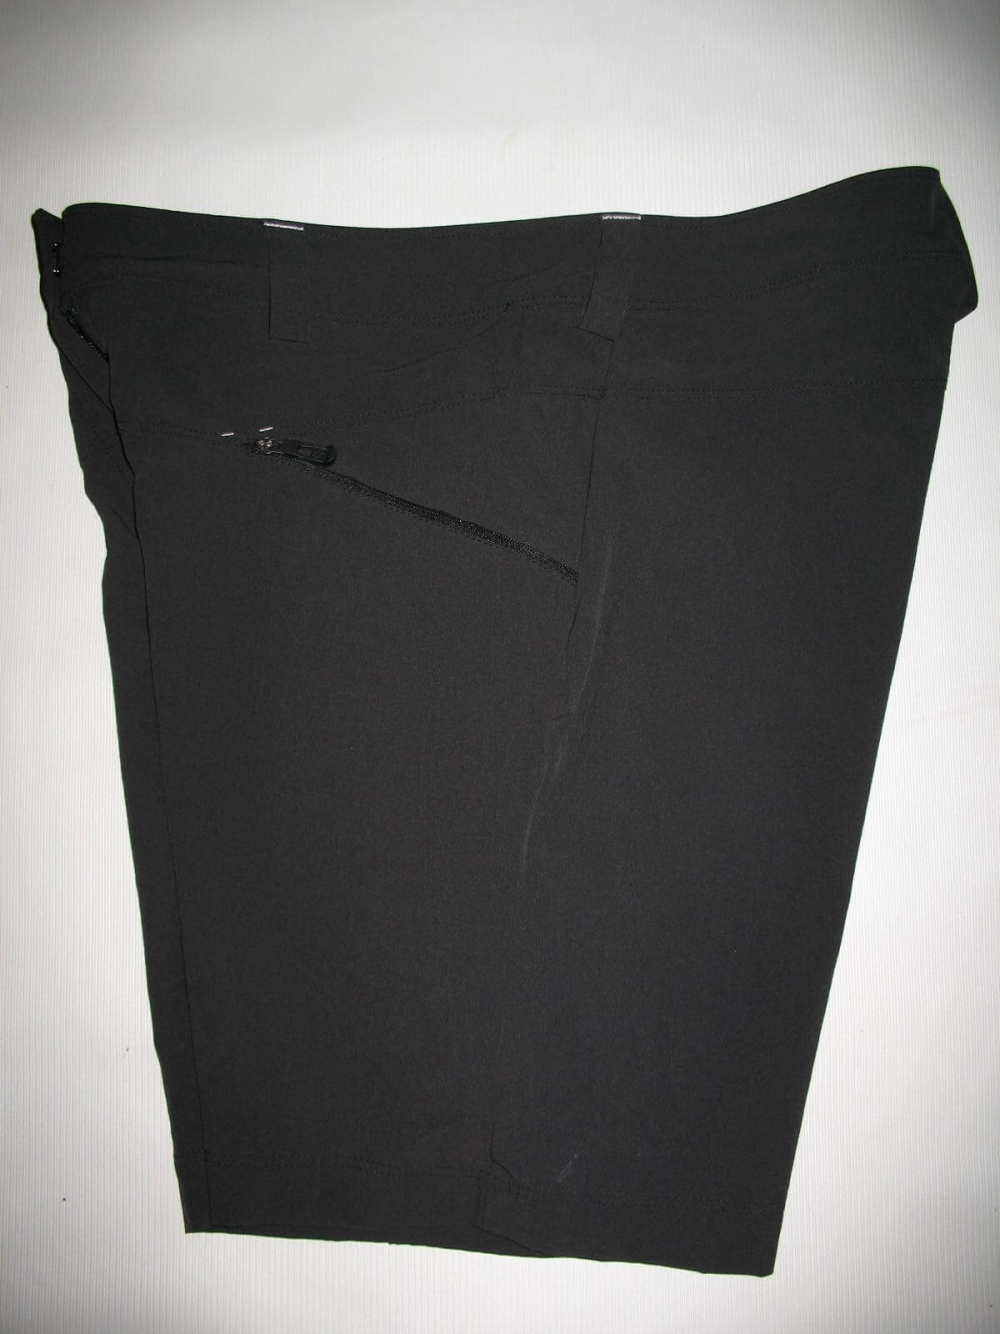 Шорты SALOMON Wayfarer shorts lady (размер M/S) - 6